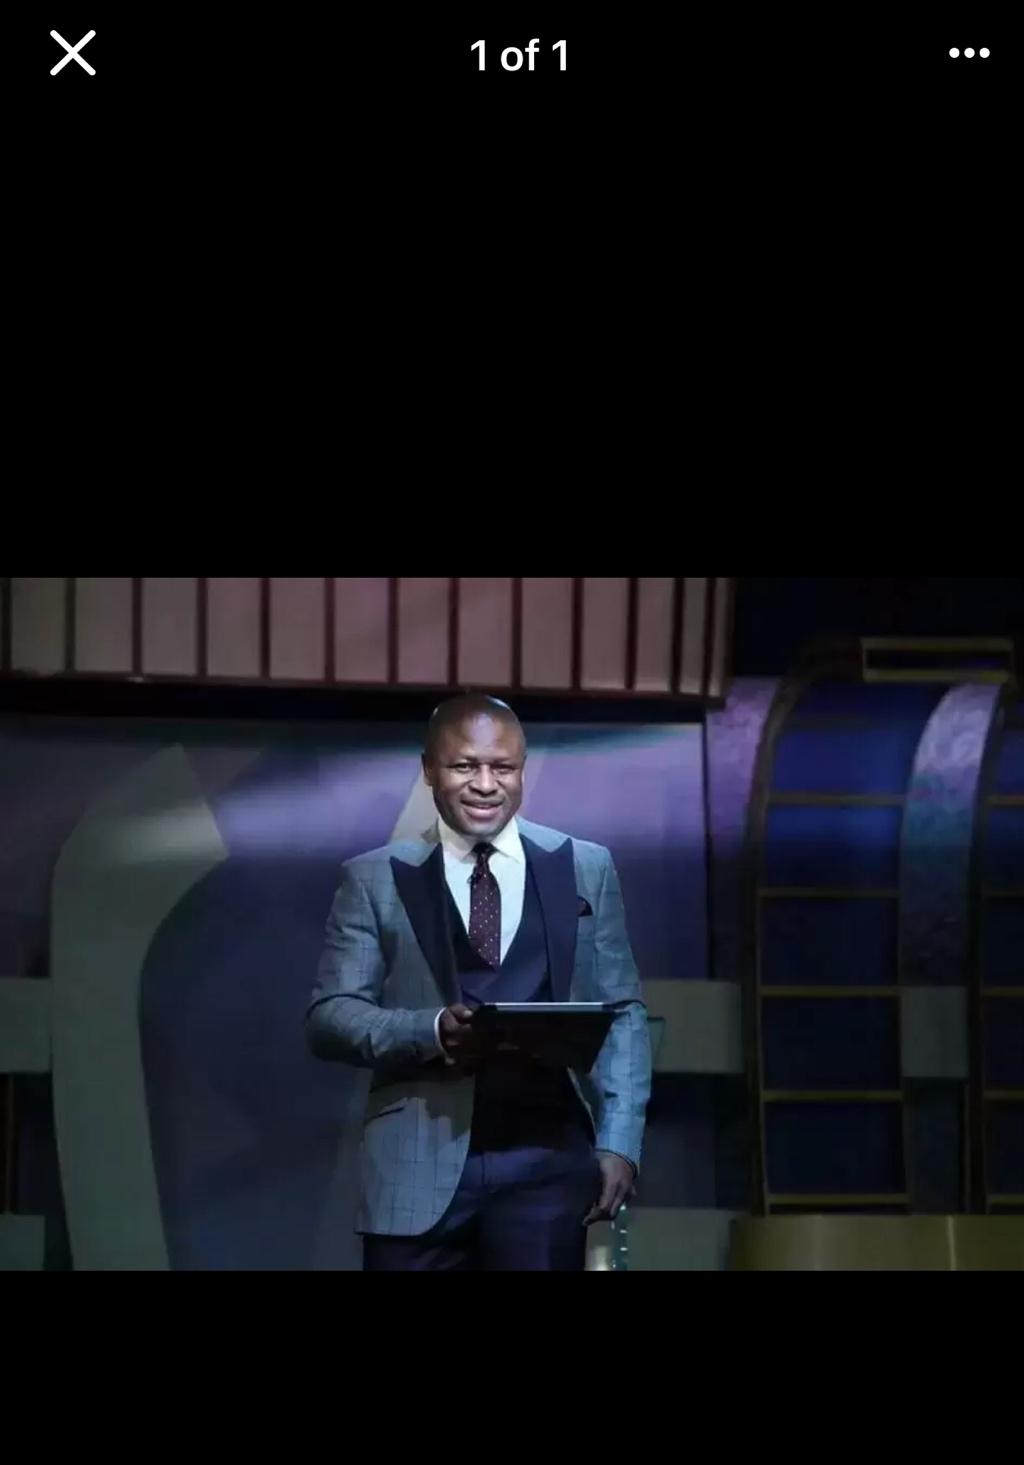 Happy birthday dearest Pastor sir.